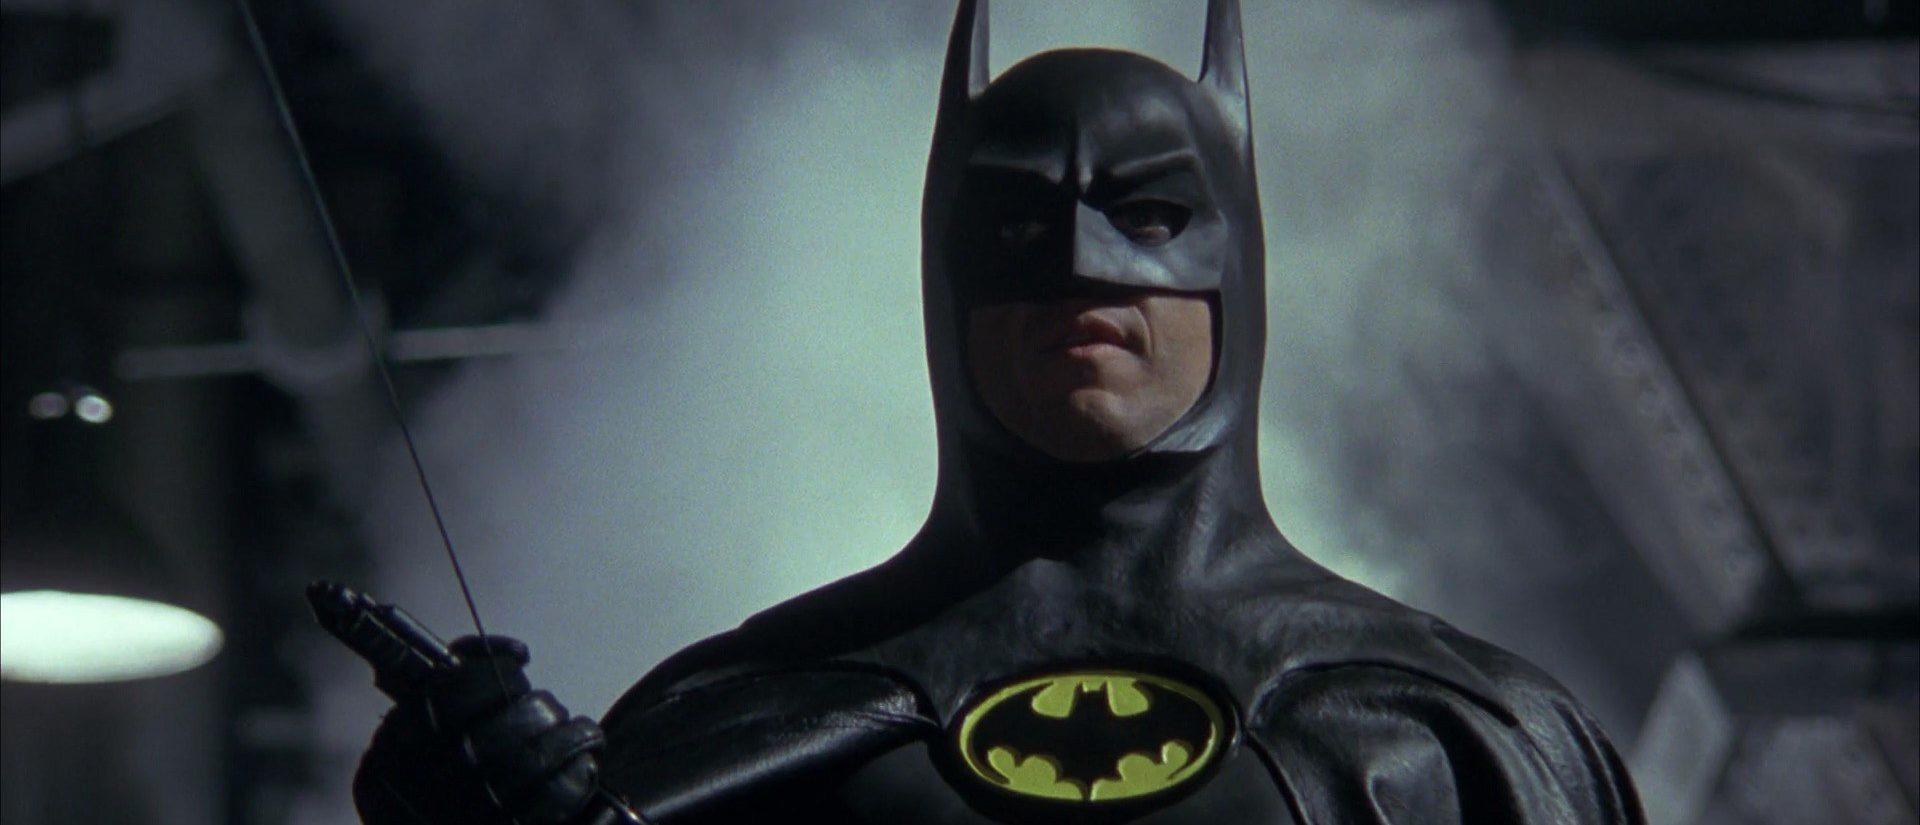 comPOSERS Episode 69: Batman (1989)